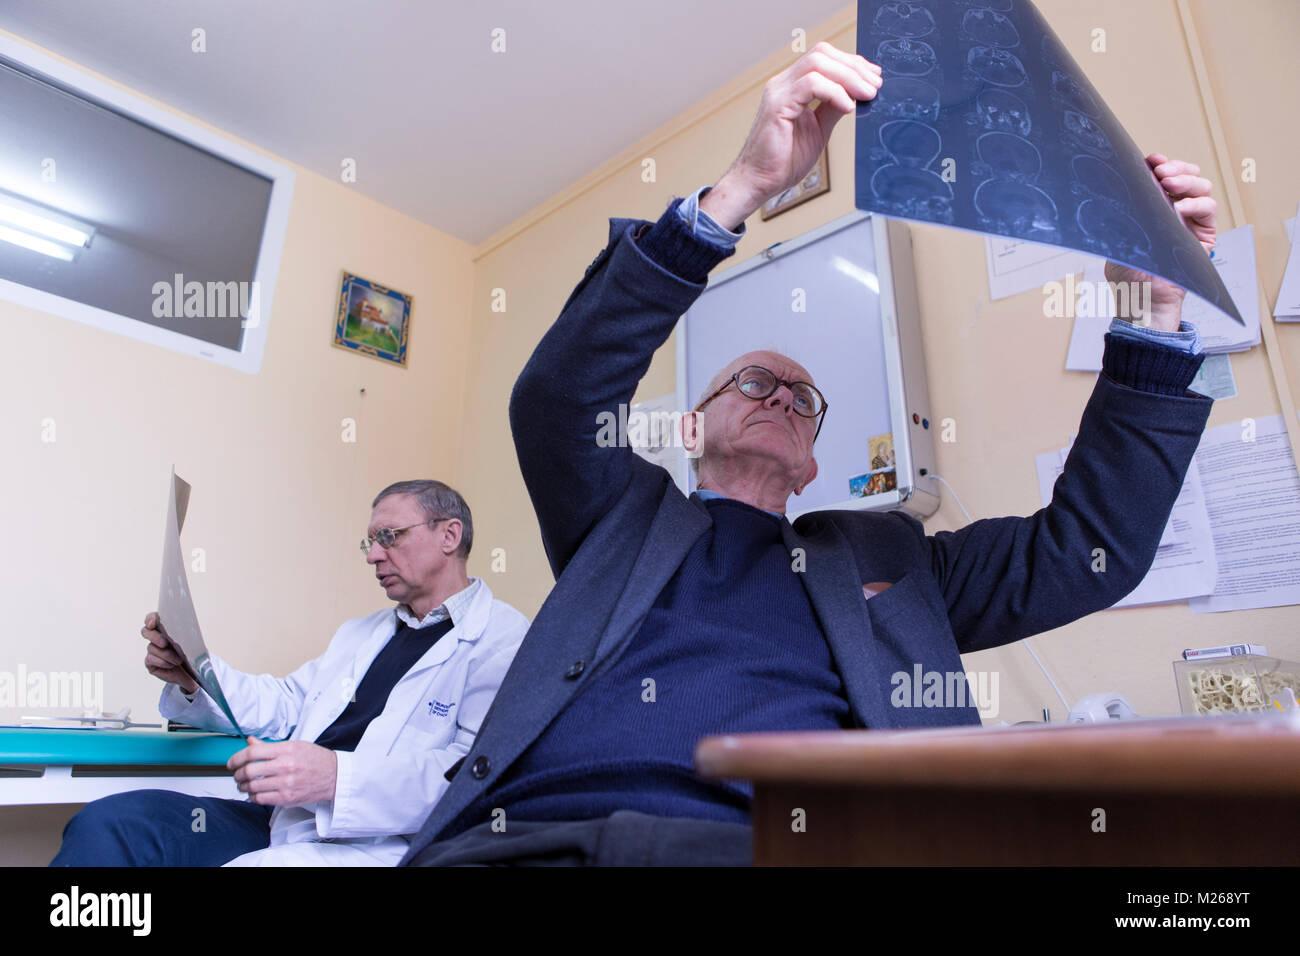 Lviv, Ukraine - 5th February 2016. Henry Marsh CBE FRCS is a world leading British neurosurgeon and a pioneer of Stock Photo